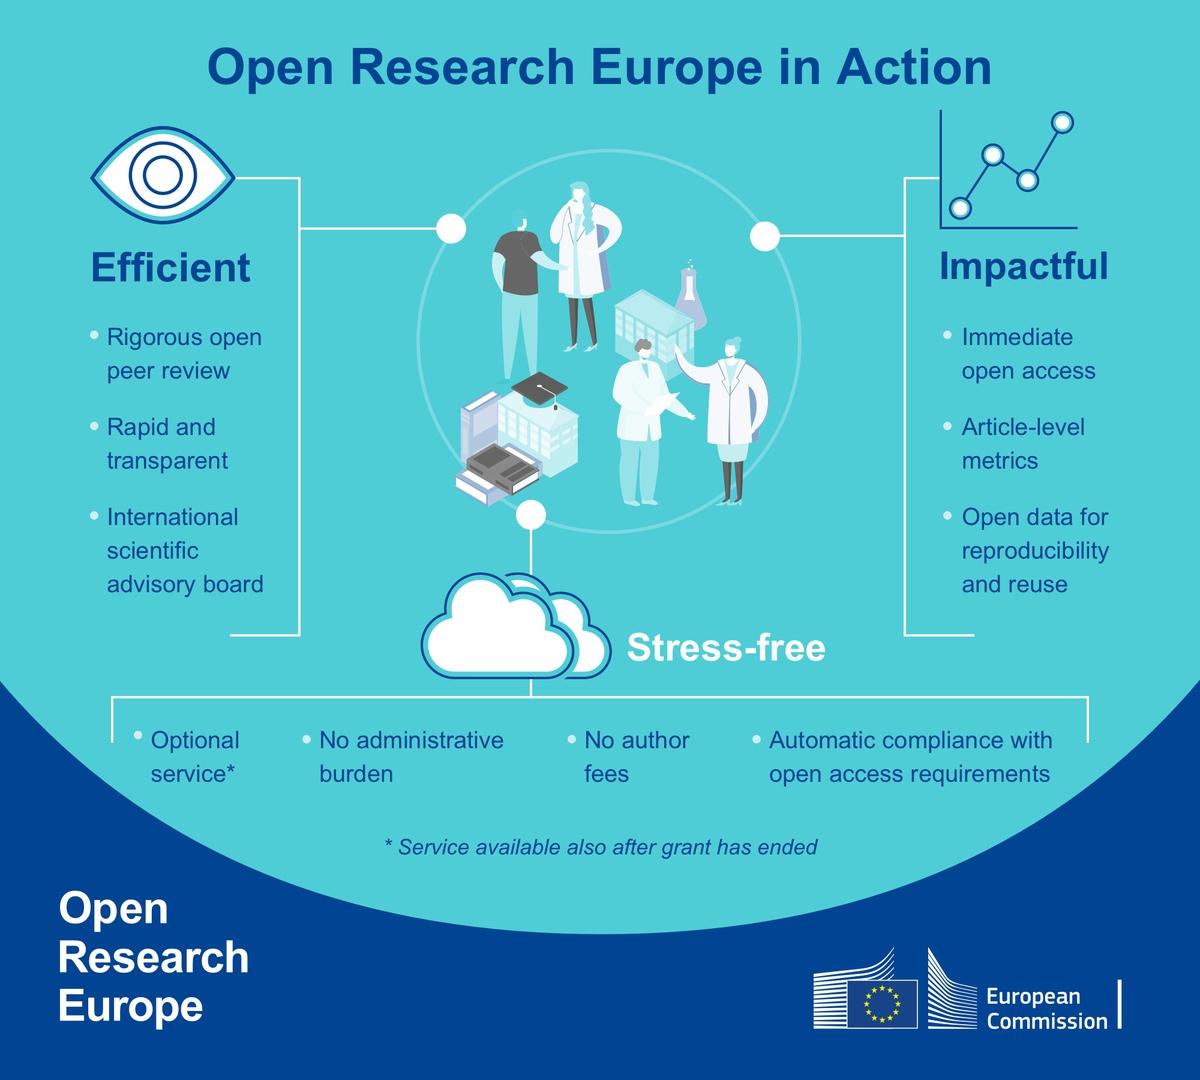 Open Research Europe (@OpenResearch_EU) | Twitter